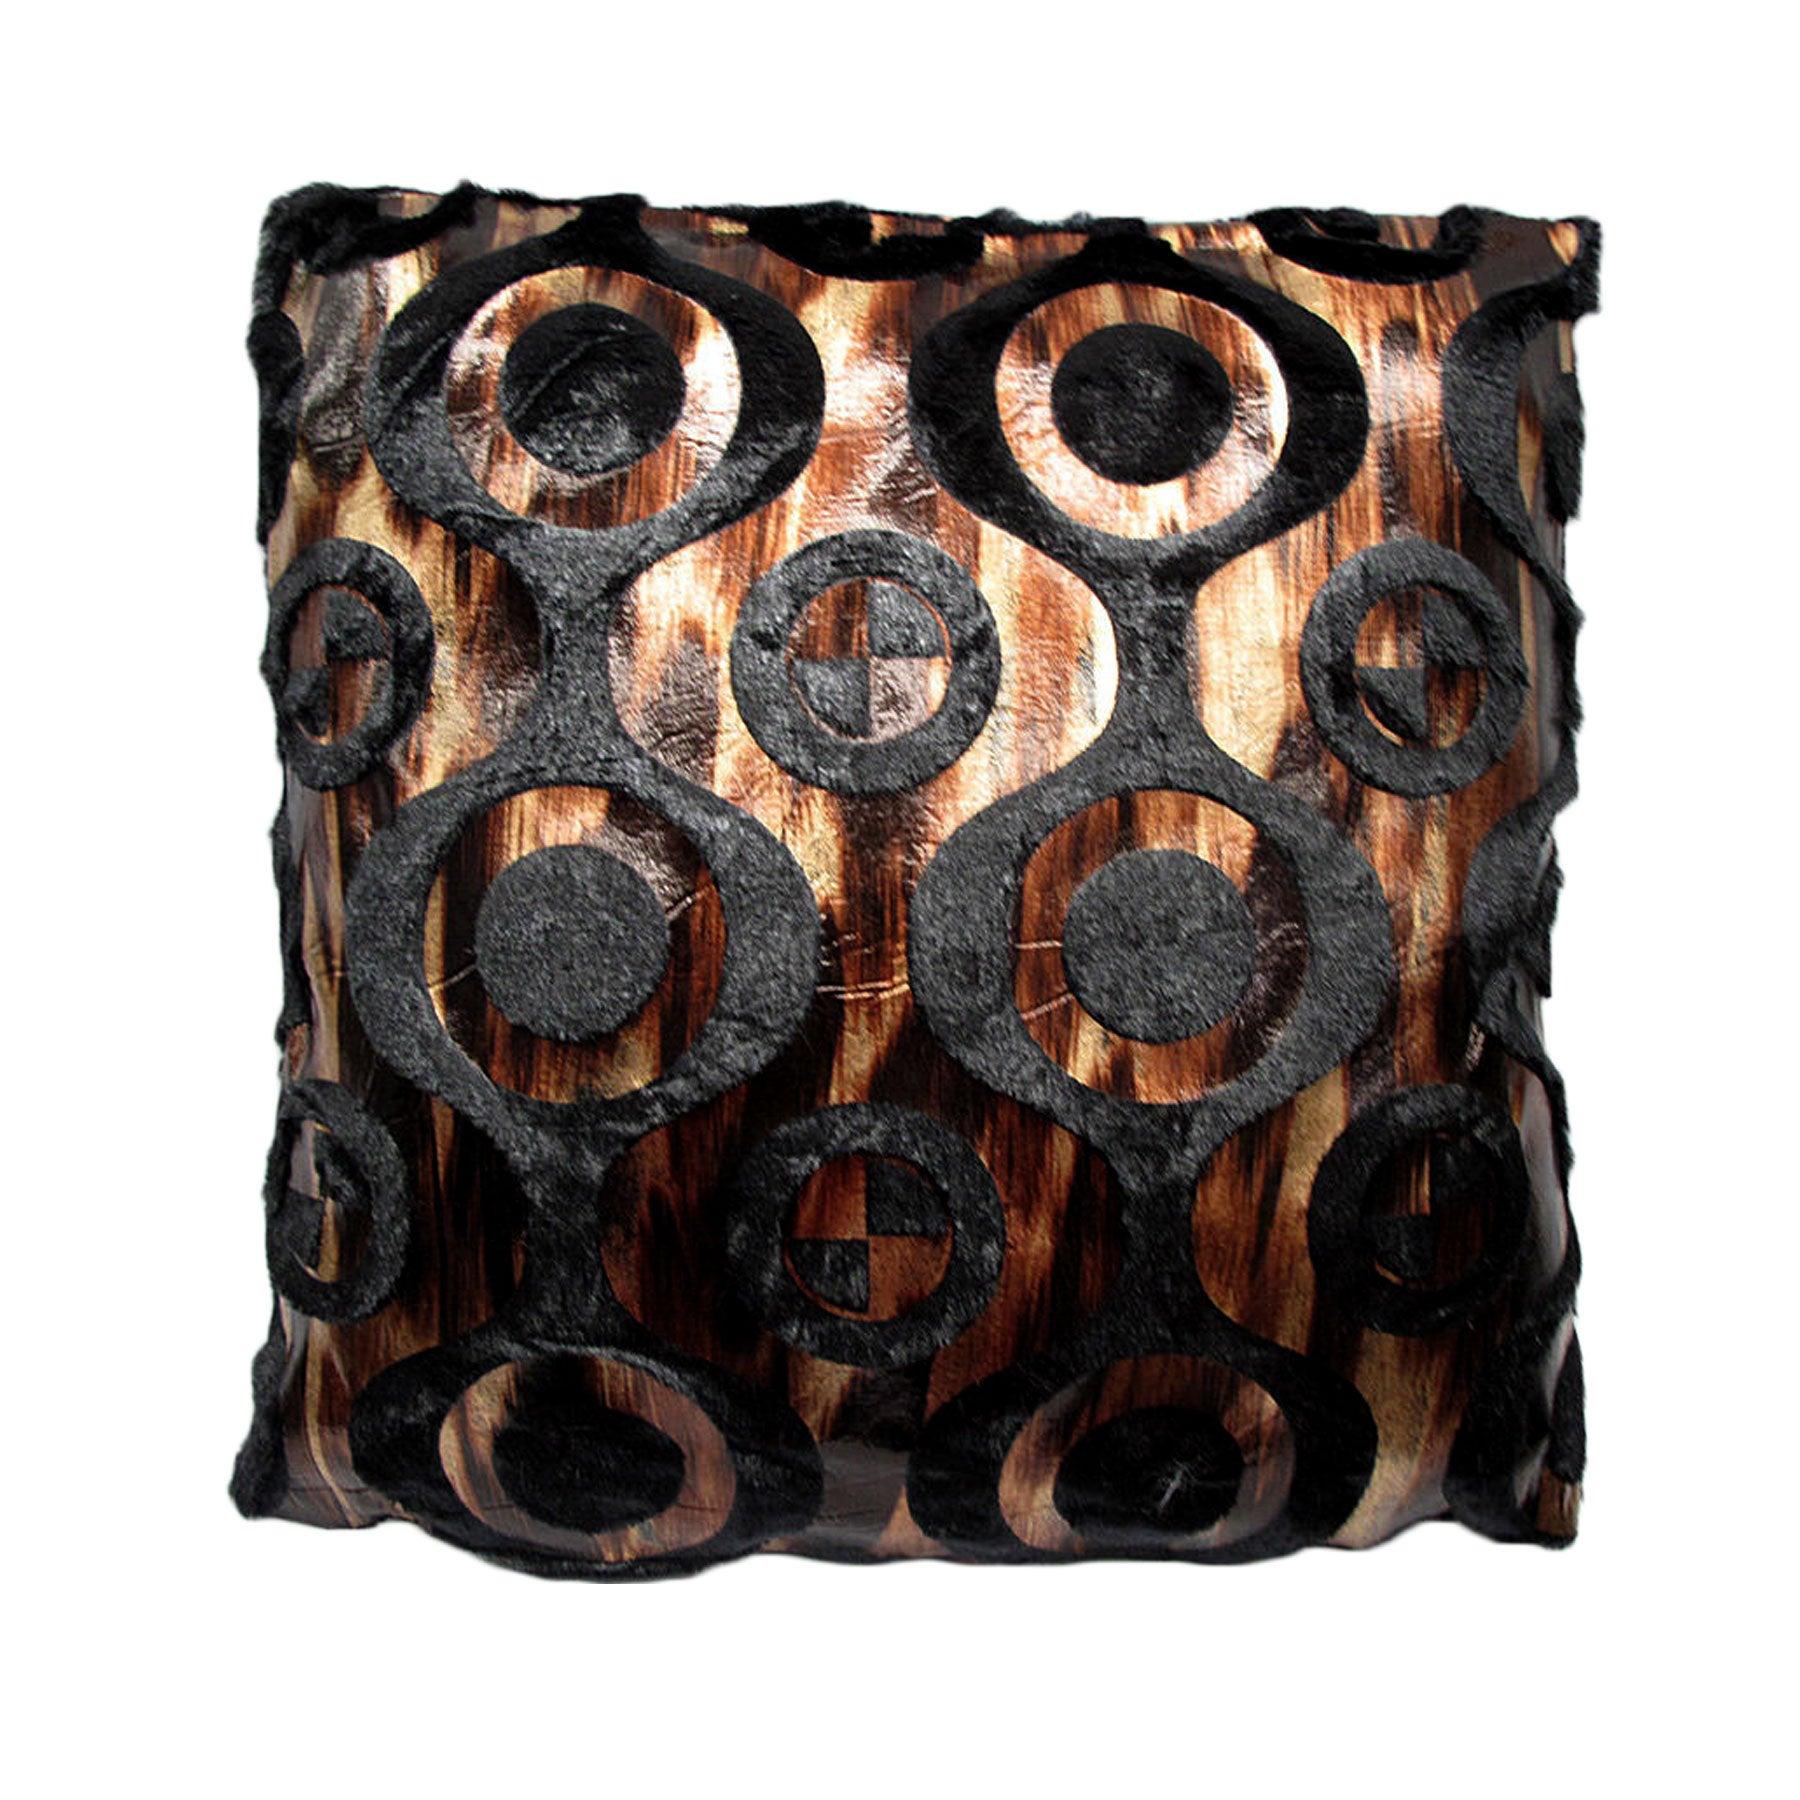 Fashion Burn-Out Cushion Austin Black by Hotel Living